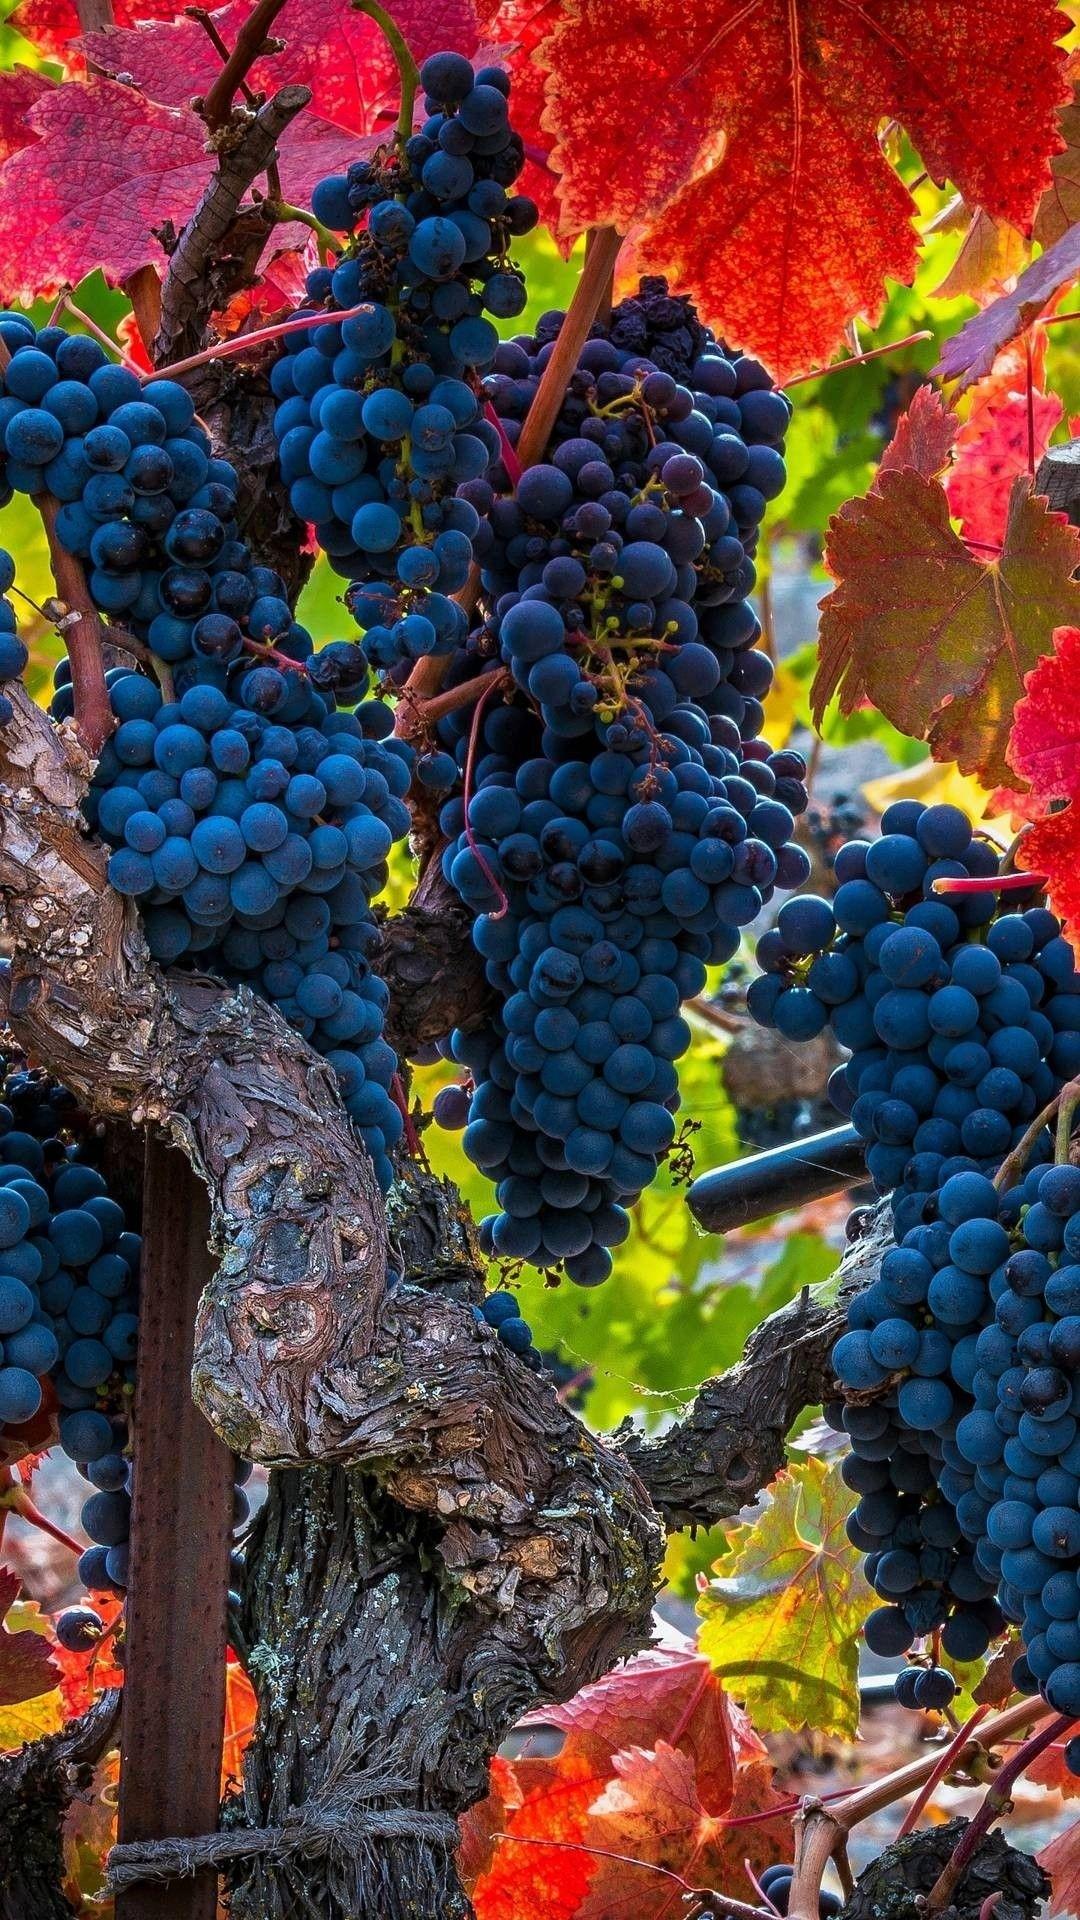 Vineyard Vines iPhone 5 wallpaper